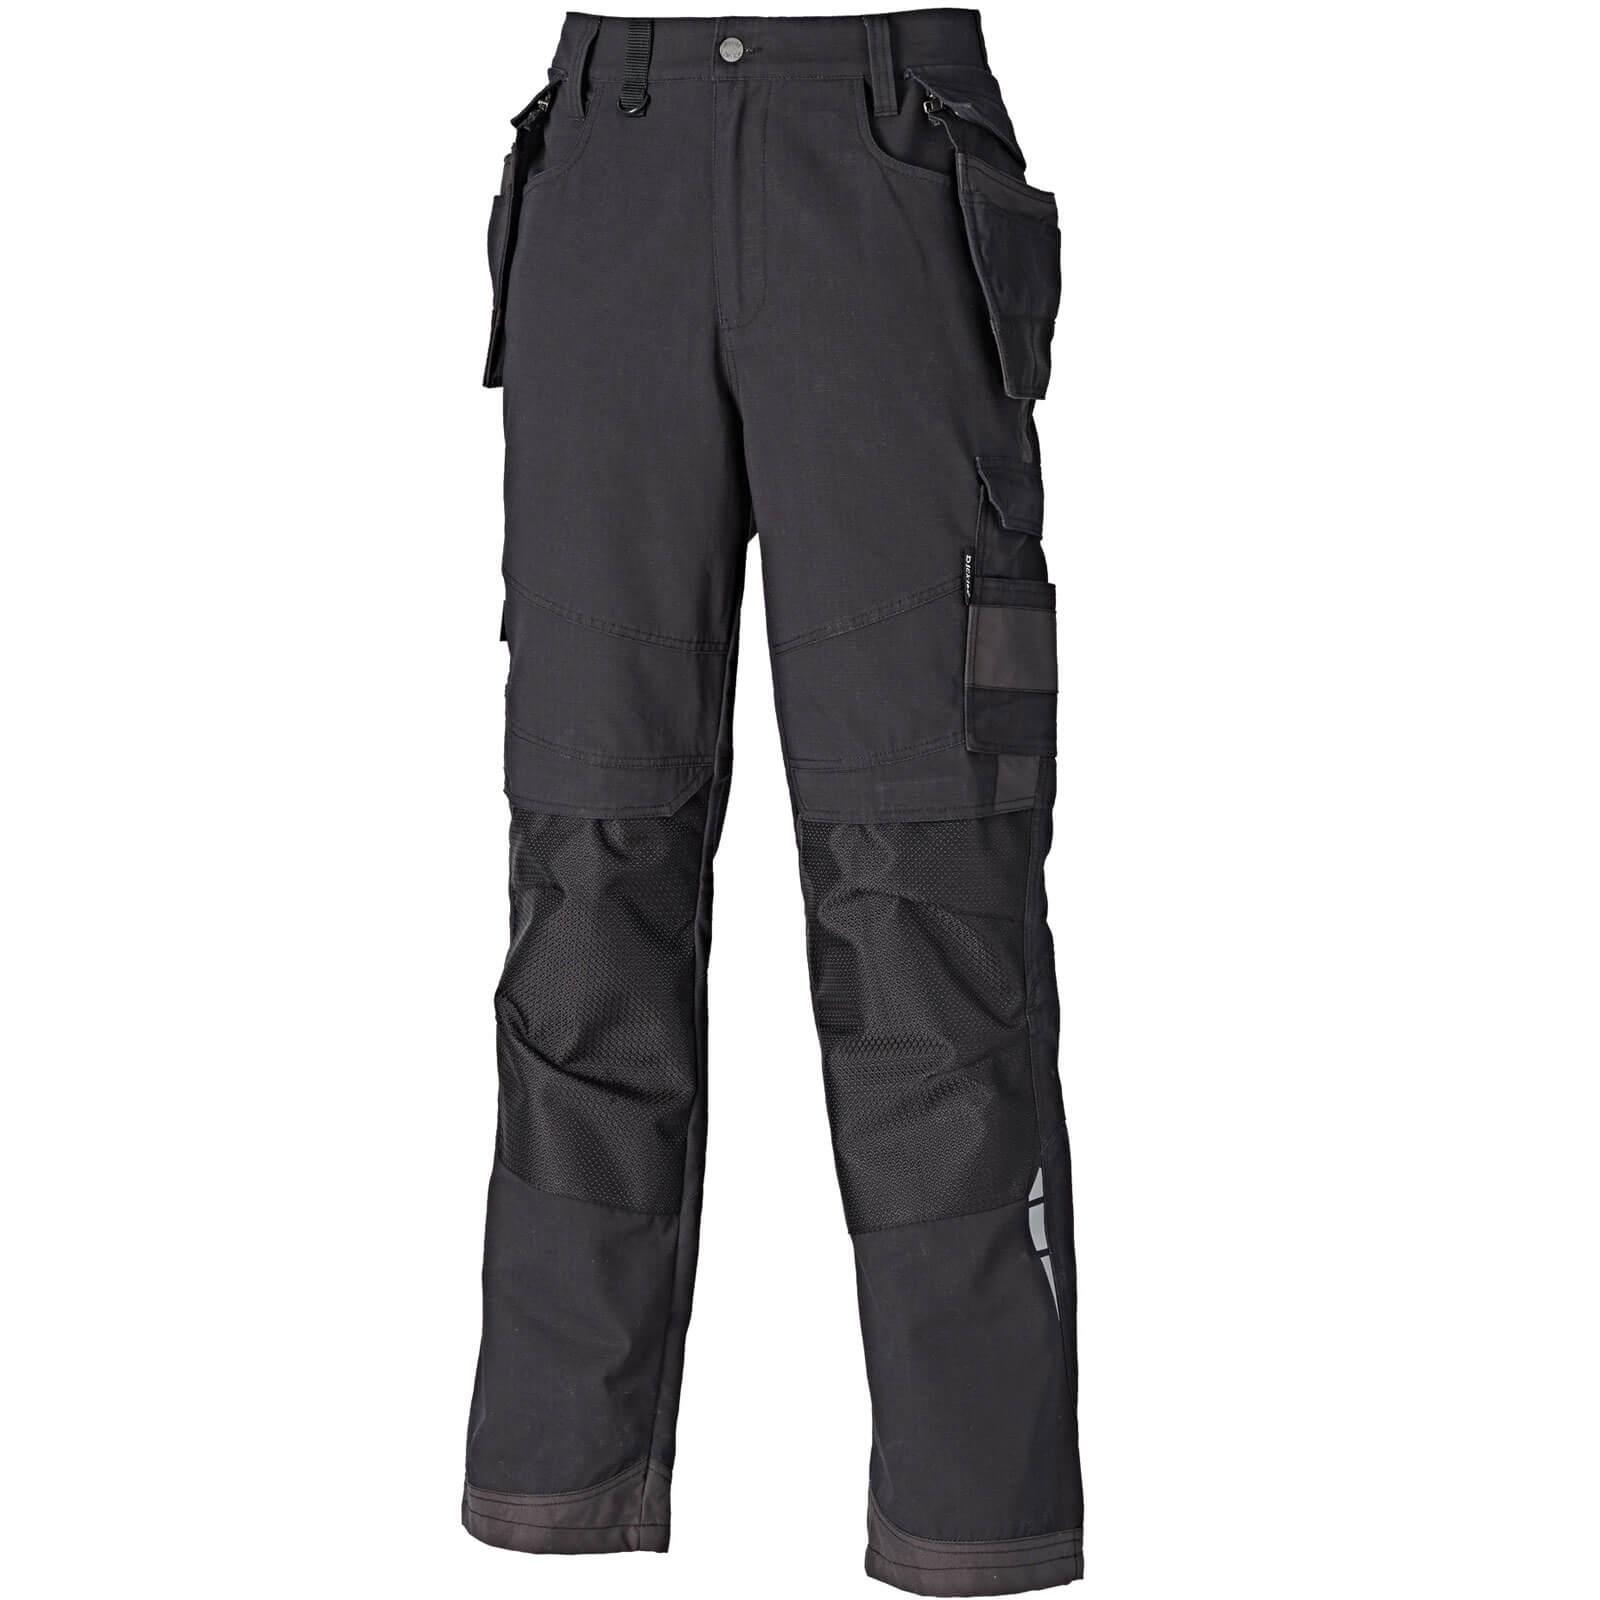 Photo of Dickies mens eisenhower premium trousers black 38